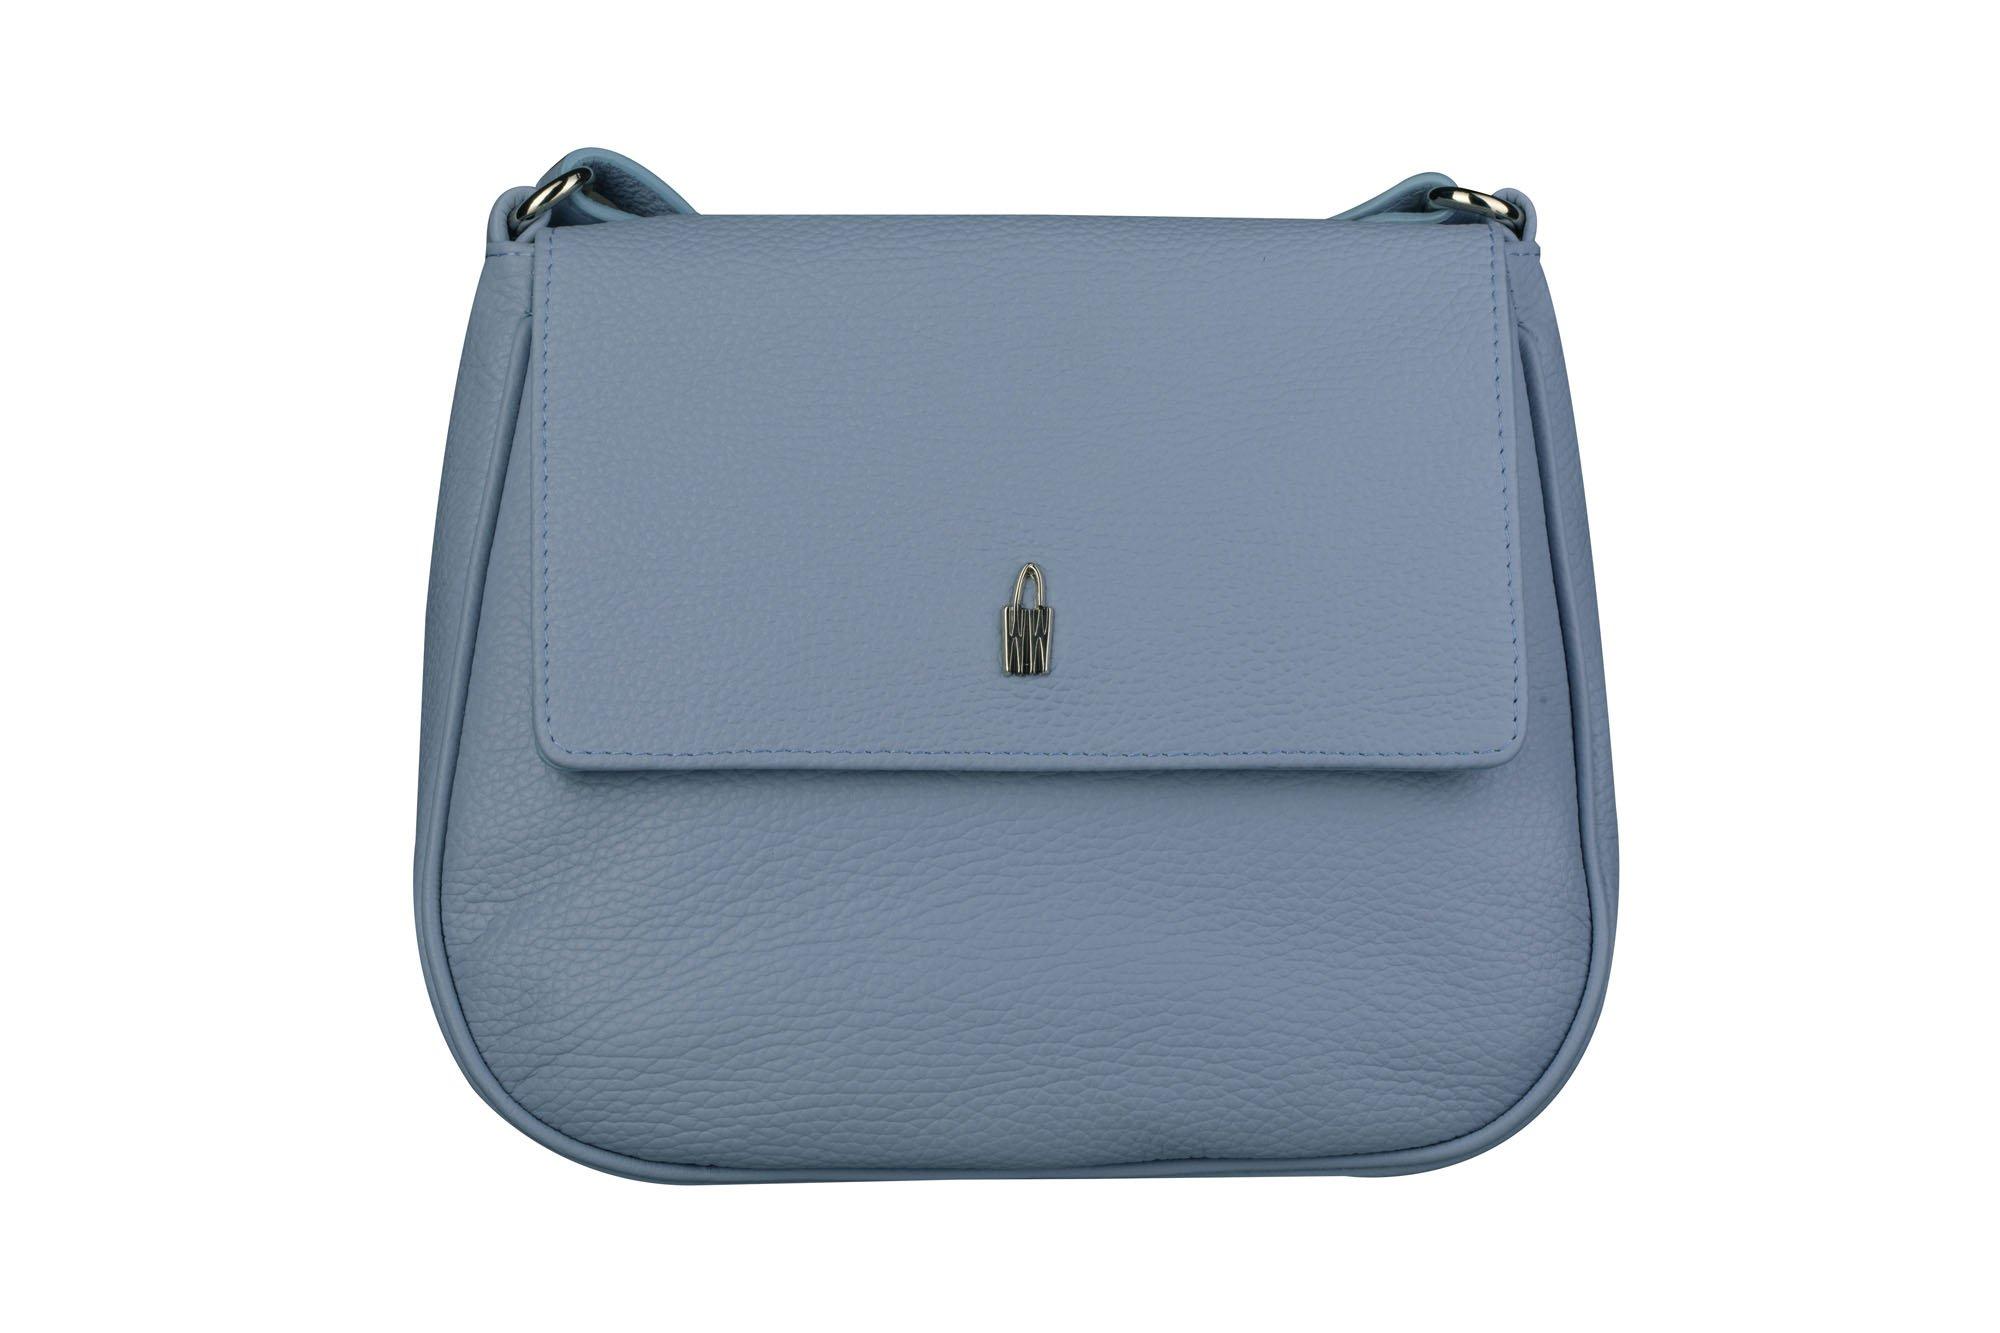 8e819ff759 Luxusní kožené crossbody kabelky Marketa modré 31723 GS47 Wojewodzic